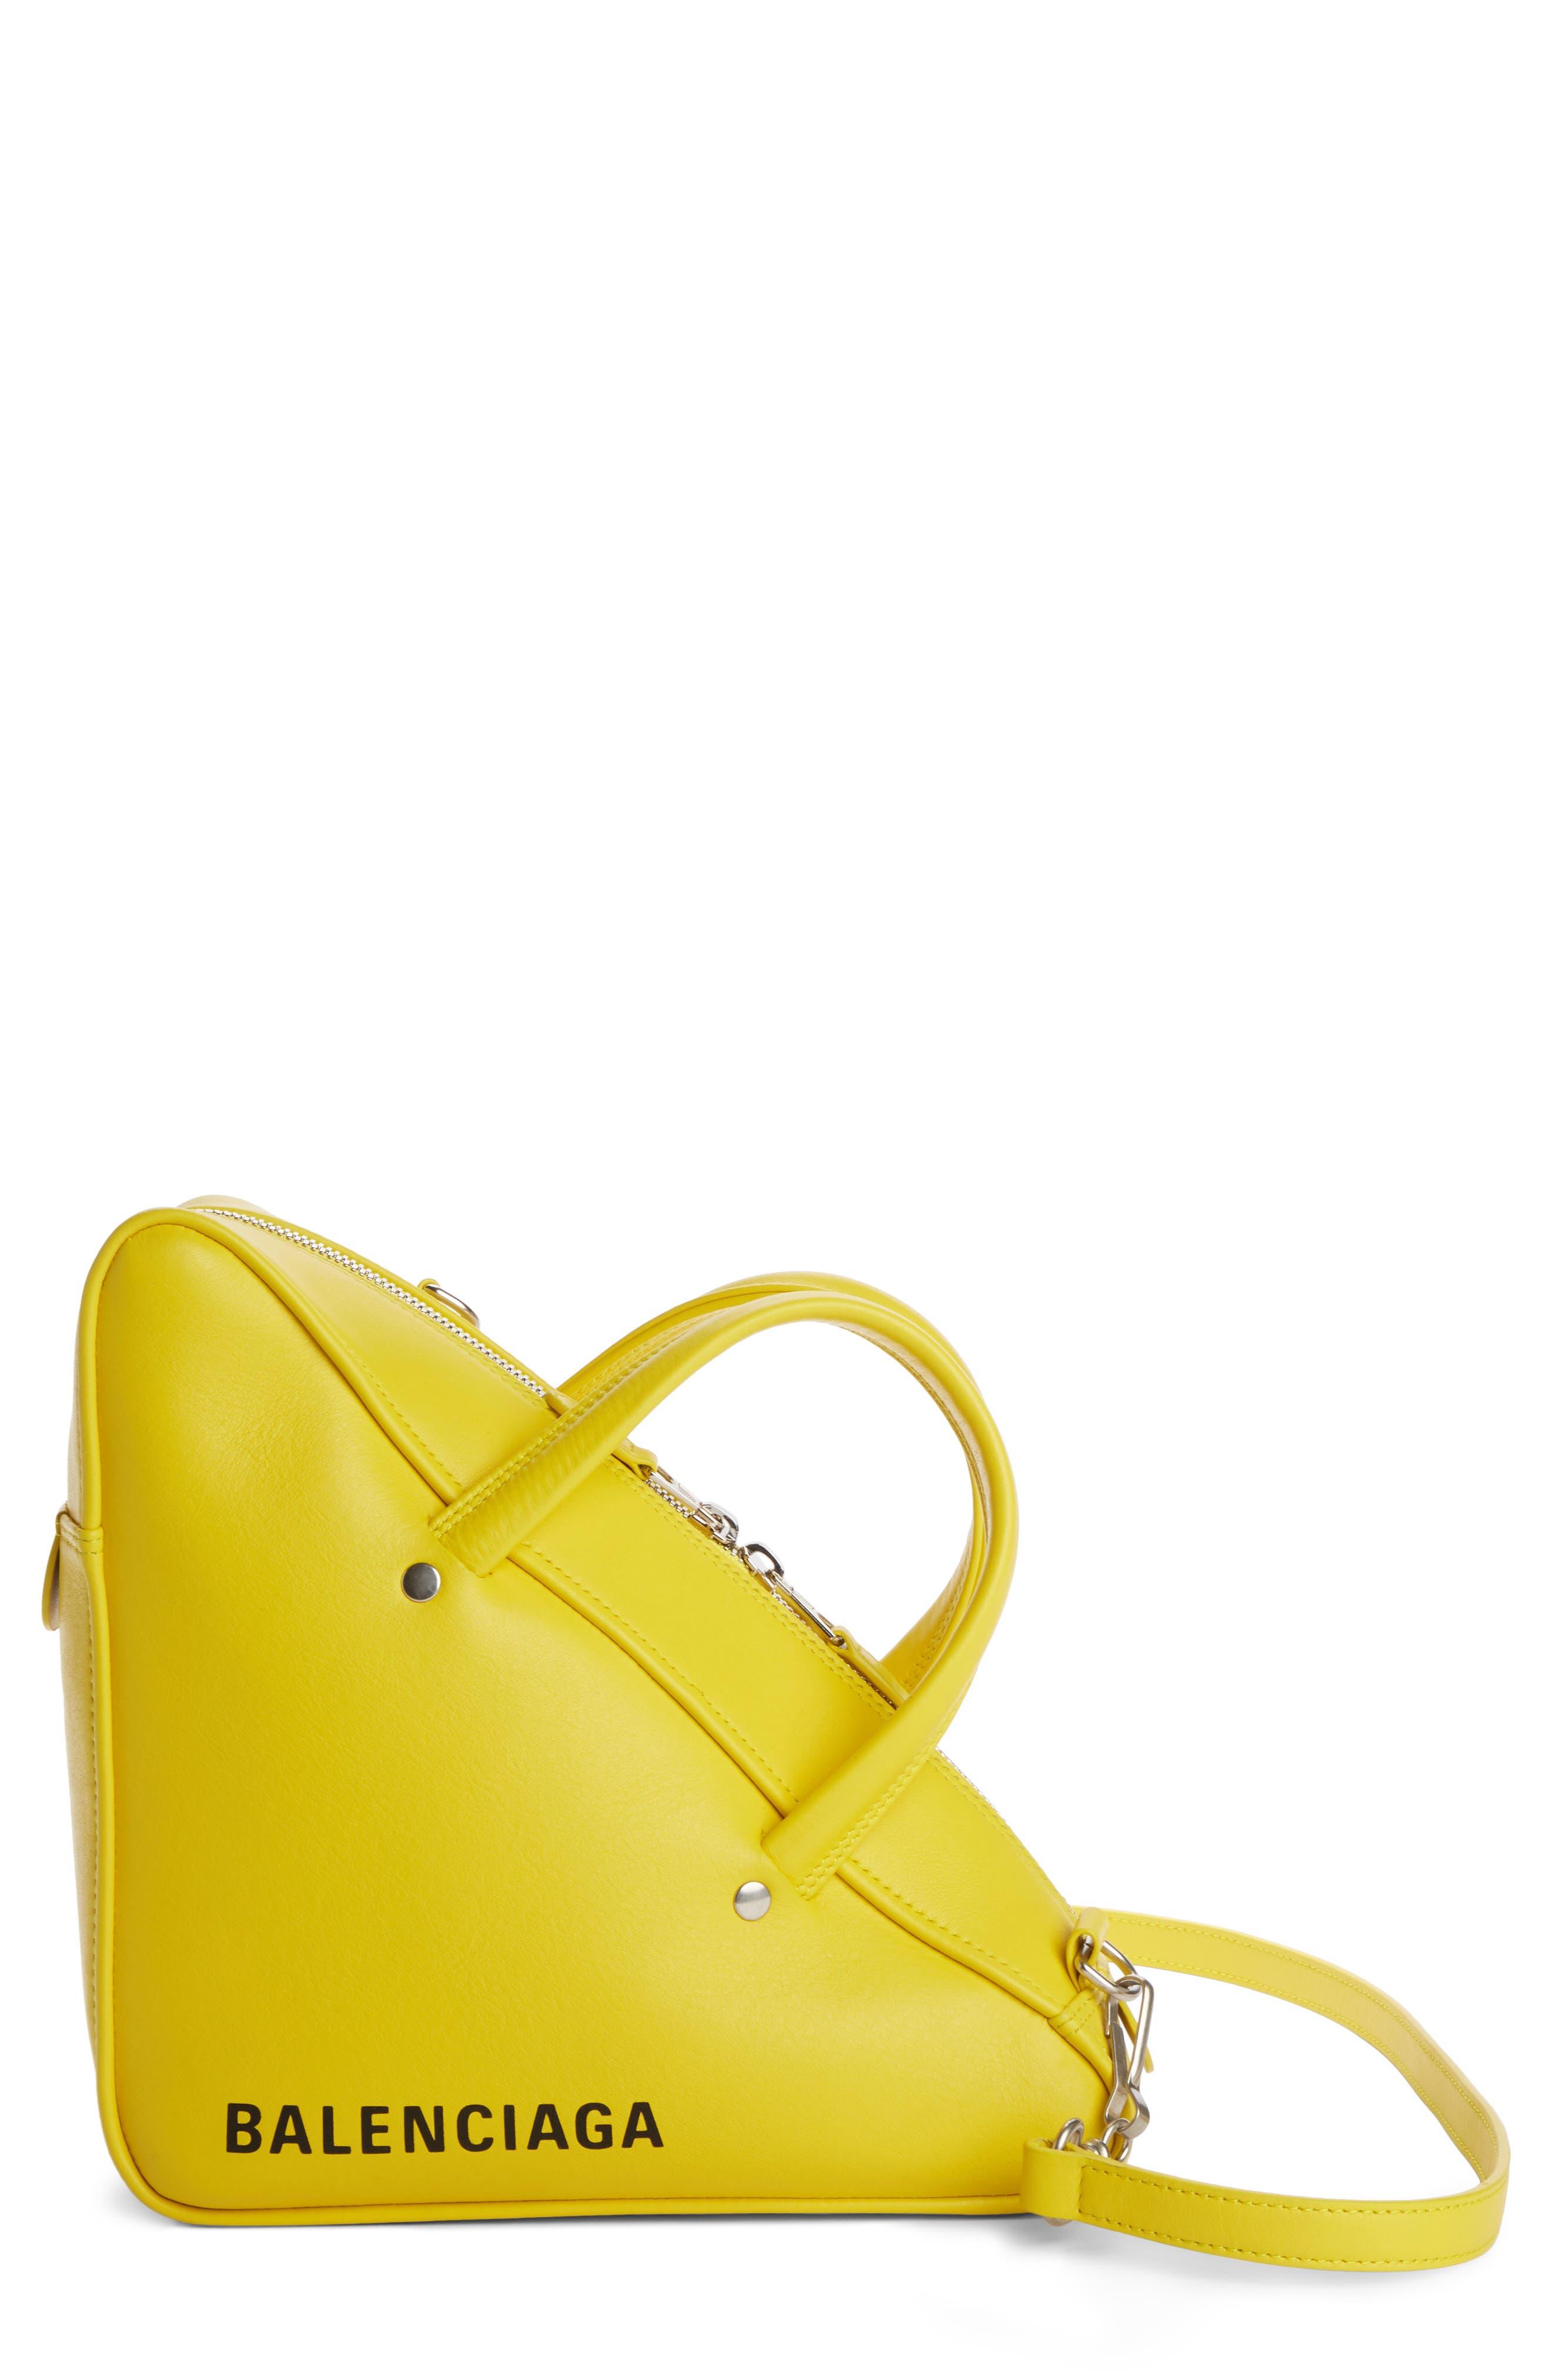 2fb0318612 Balenciaga small triangle duffel bag